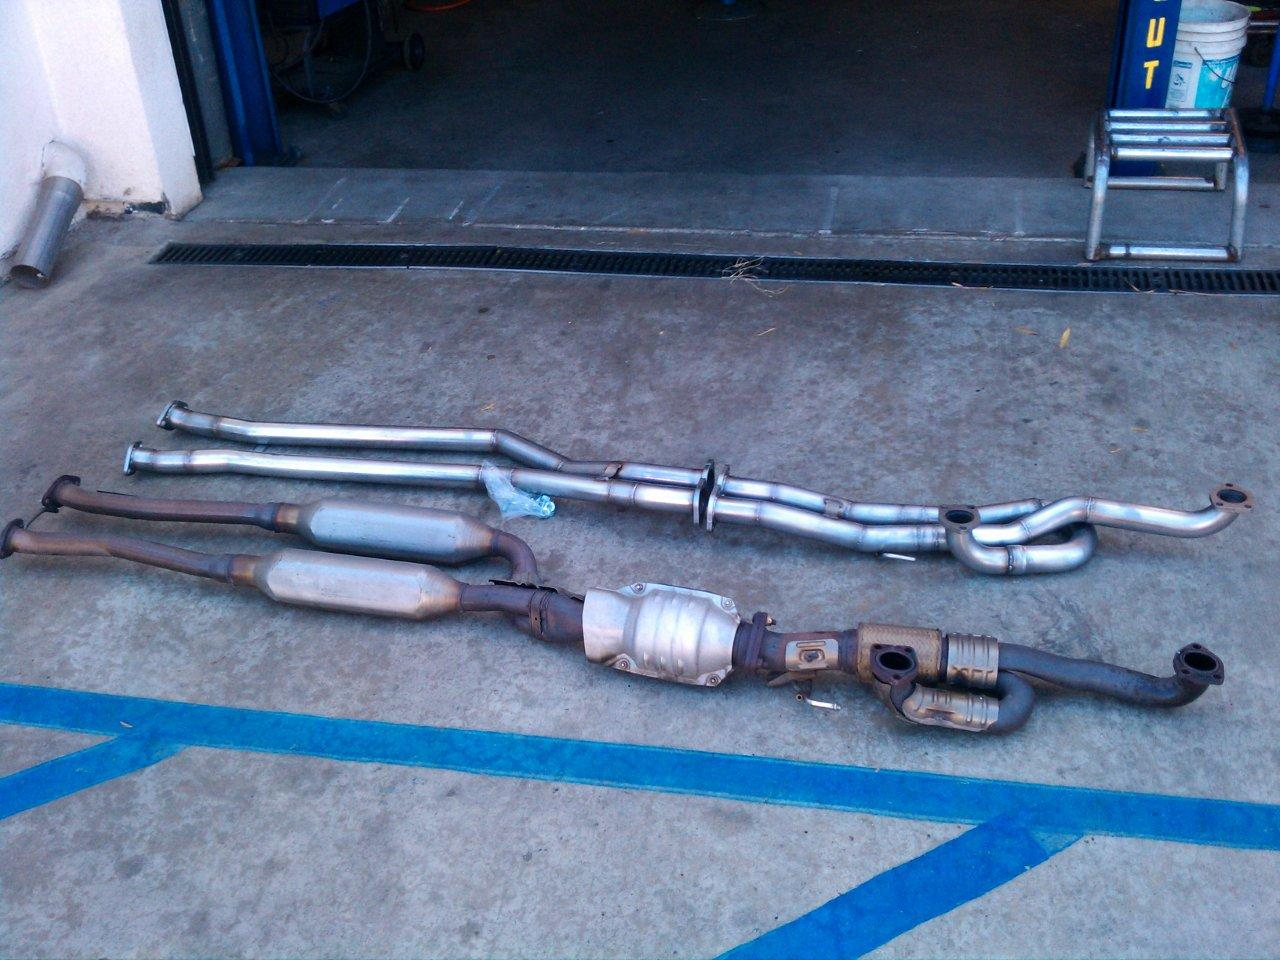 Getting Custom True Dual Exhaust - Muffler Suggestions?